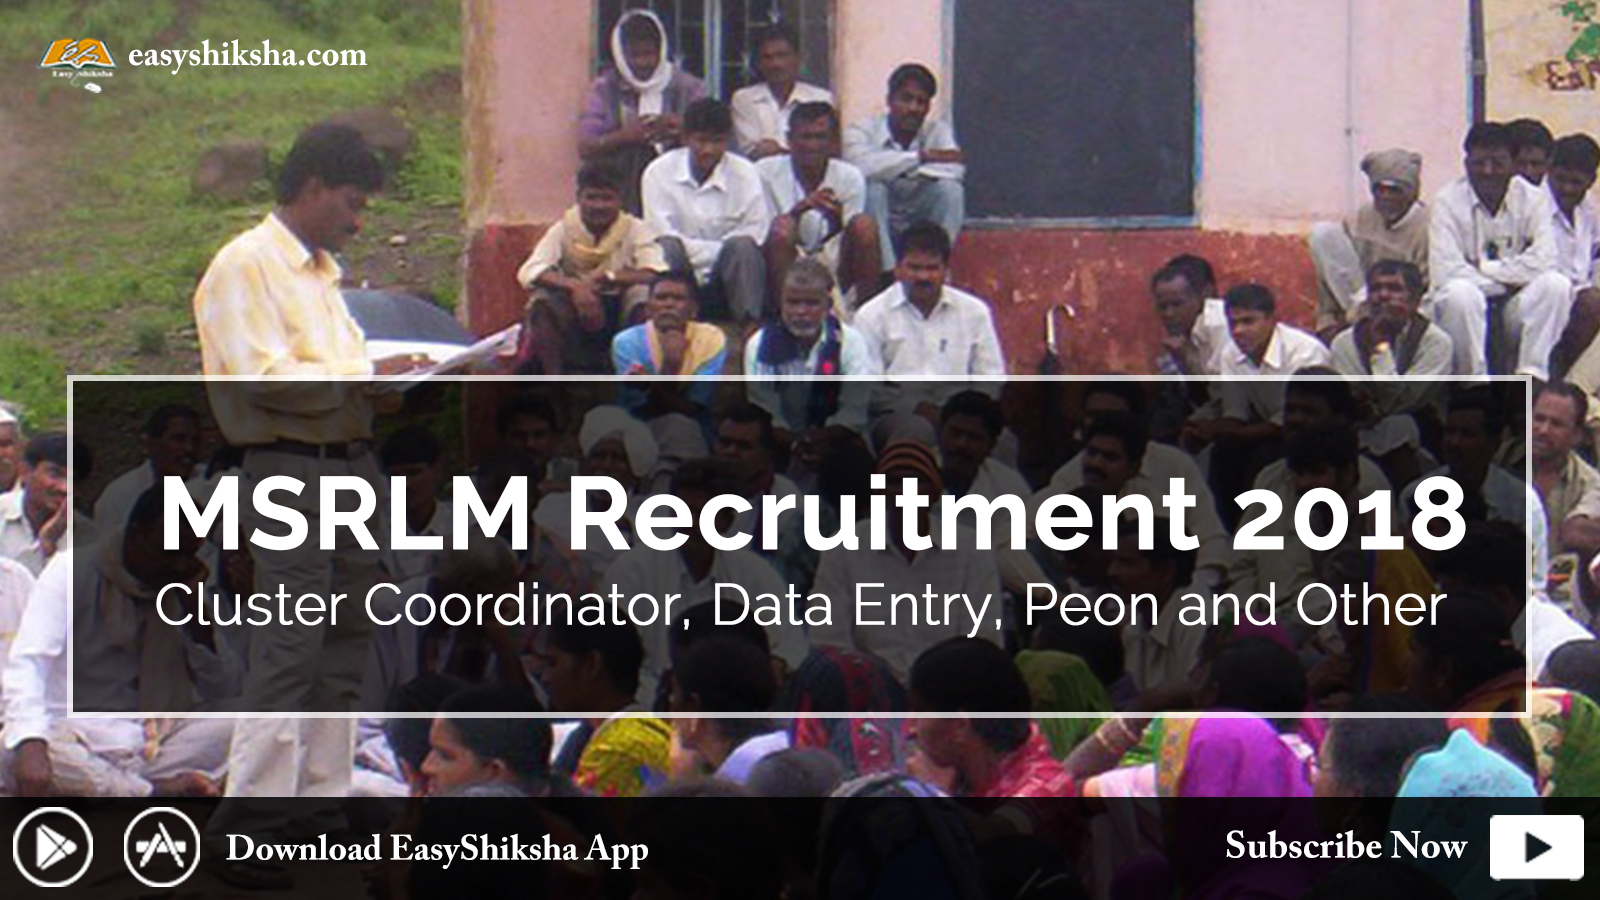 MSRLM Recruitment 2018: Cluster Coordinator, Data Entry